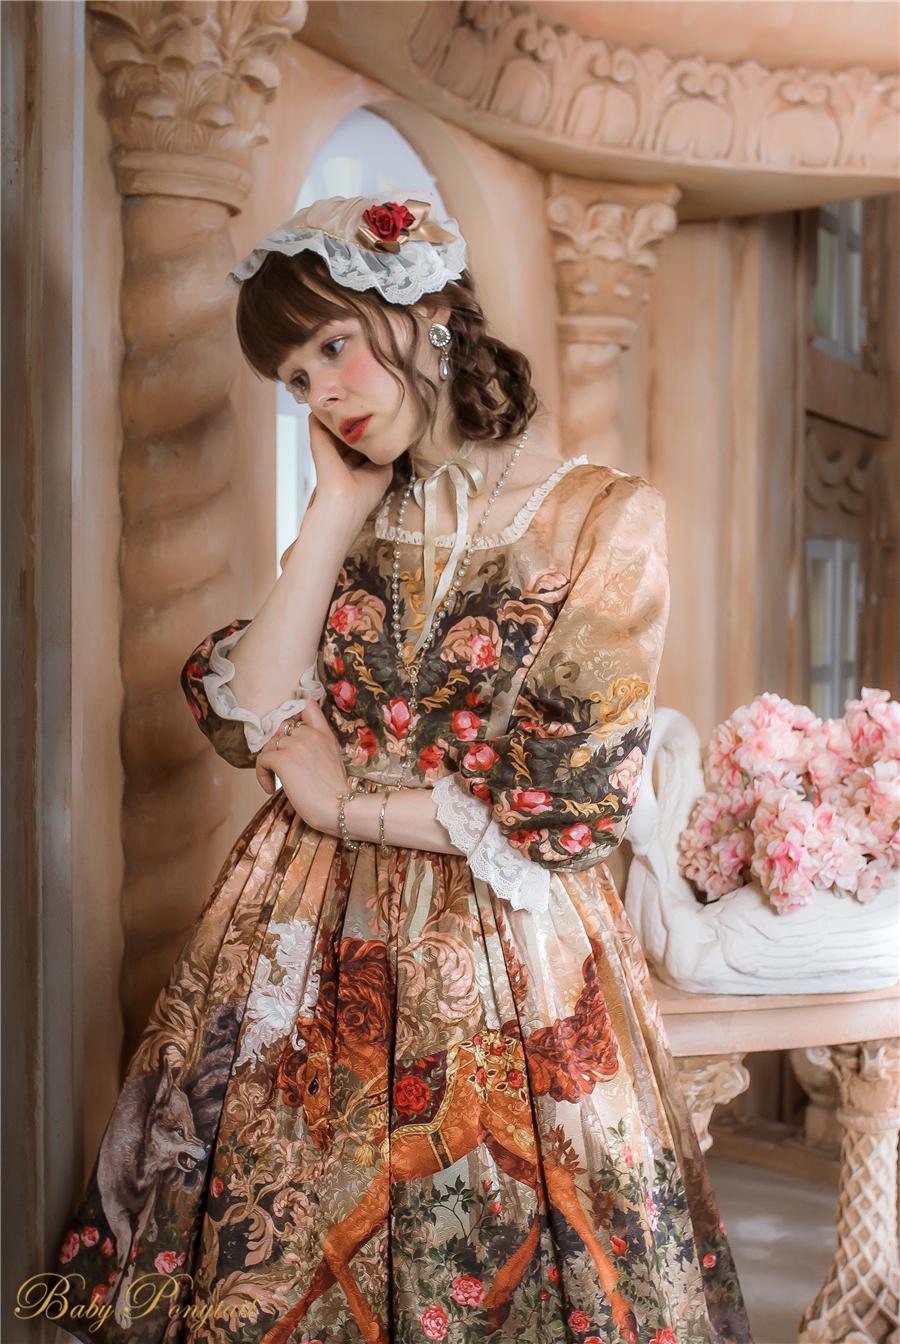 BabyPonytail_Rose Battle_Model Photo_OP Amber Studio_Claudia_07.jpg